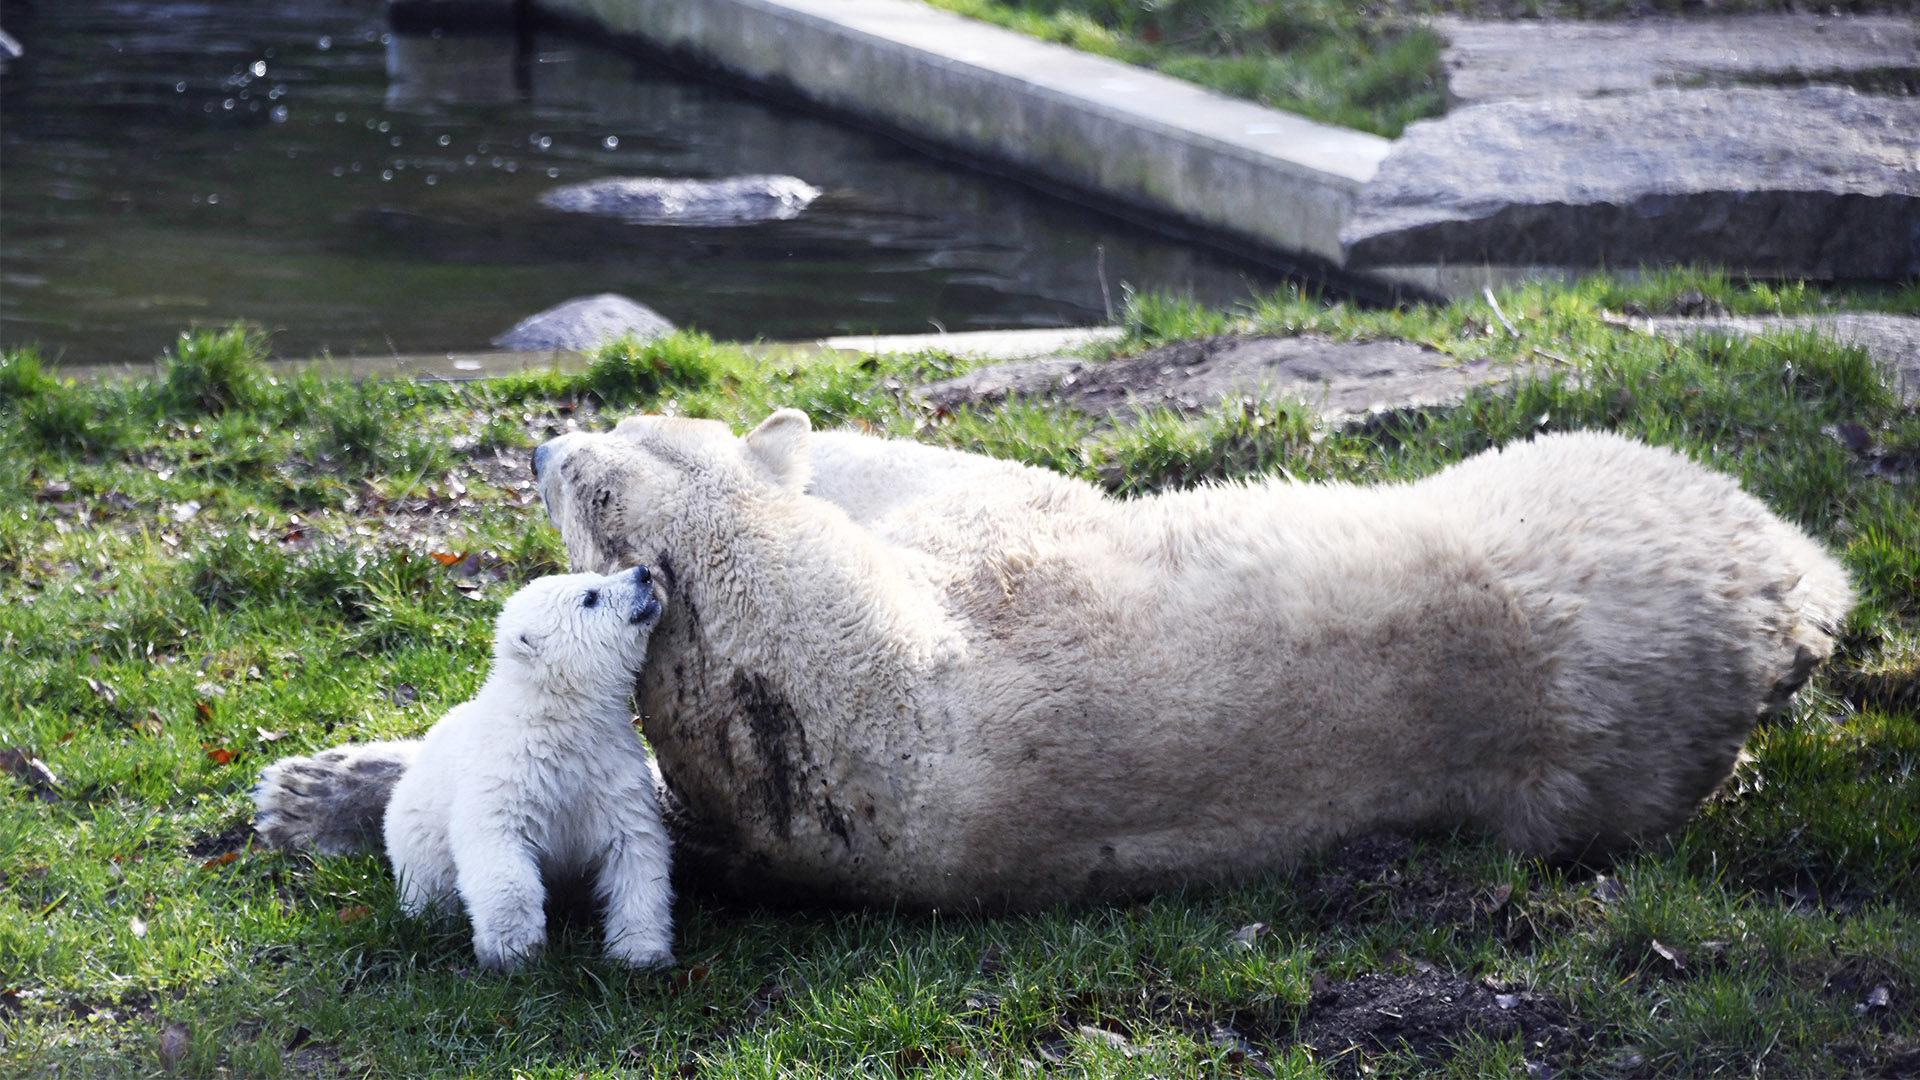 Découvrir l'ourson Kara | Mulhouse Zoo, zoological and botanical park